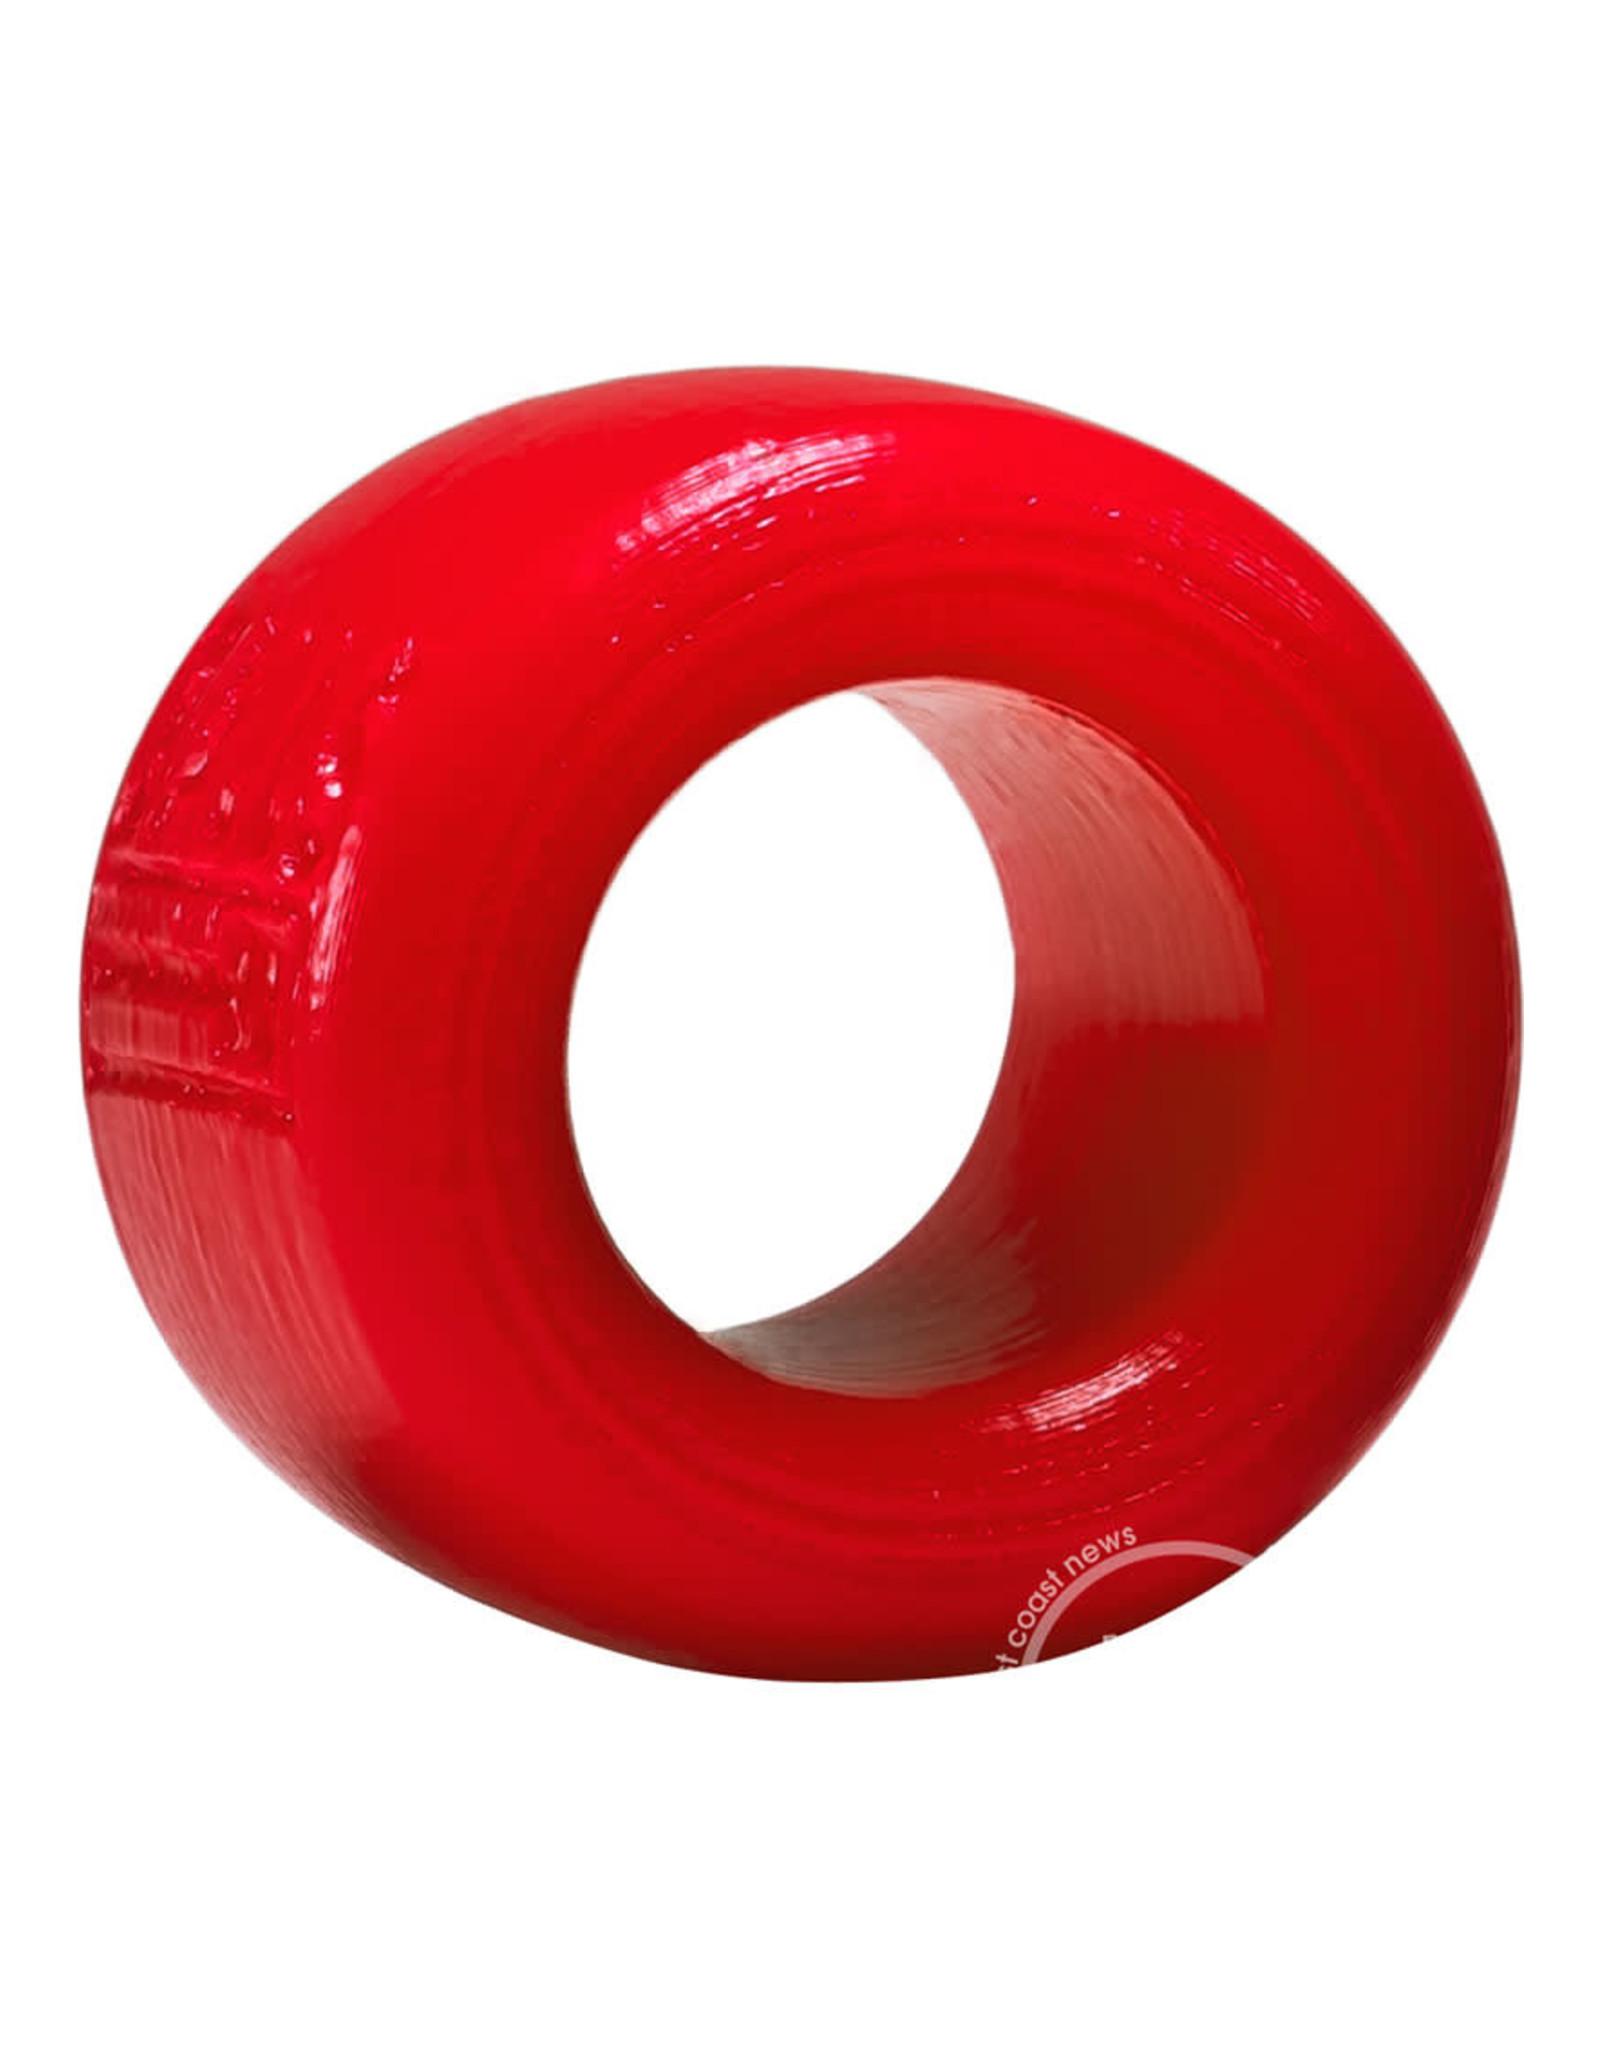 OX Balls OXBALLS ATOMIC JOCK BALLS T SILICONE BALL STRETCHER